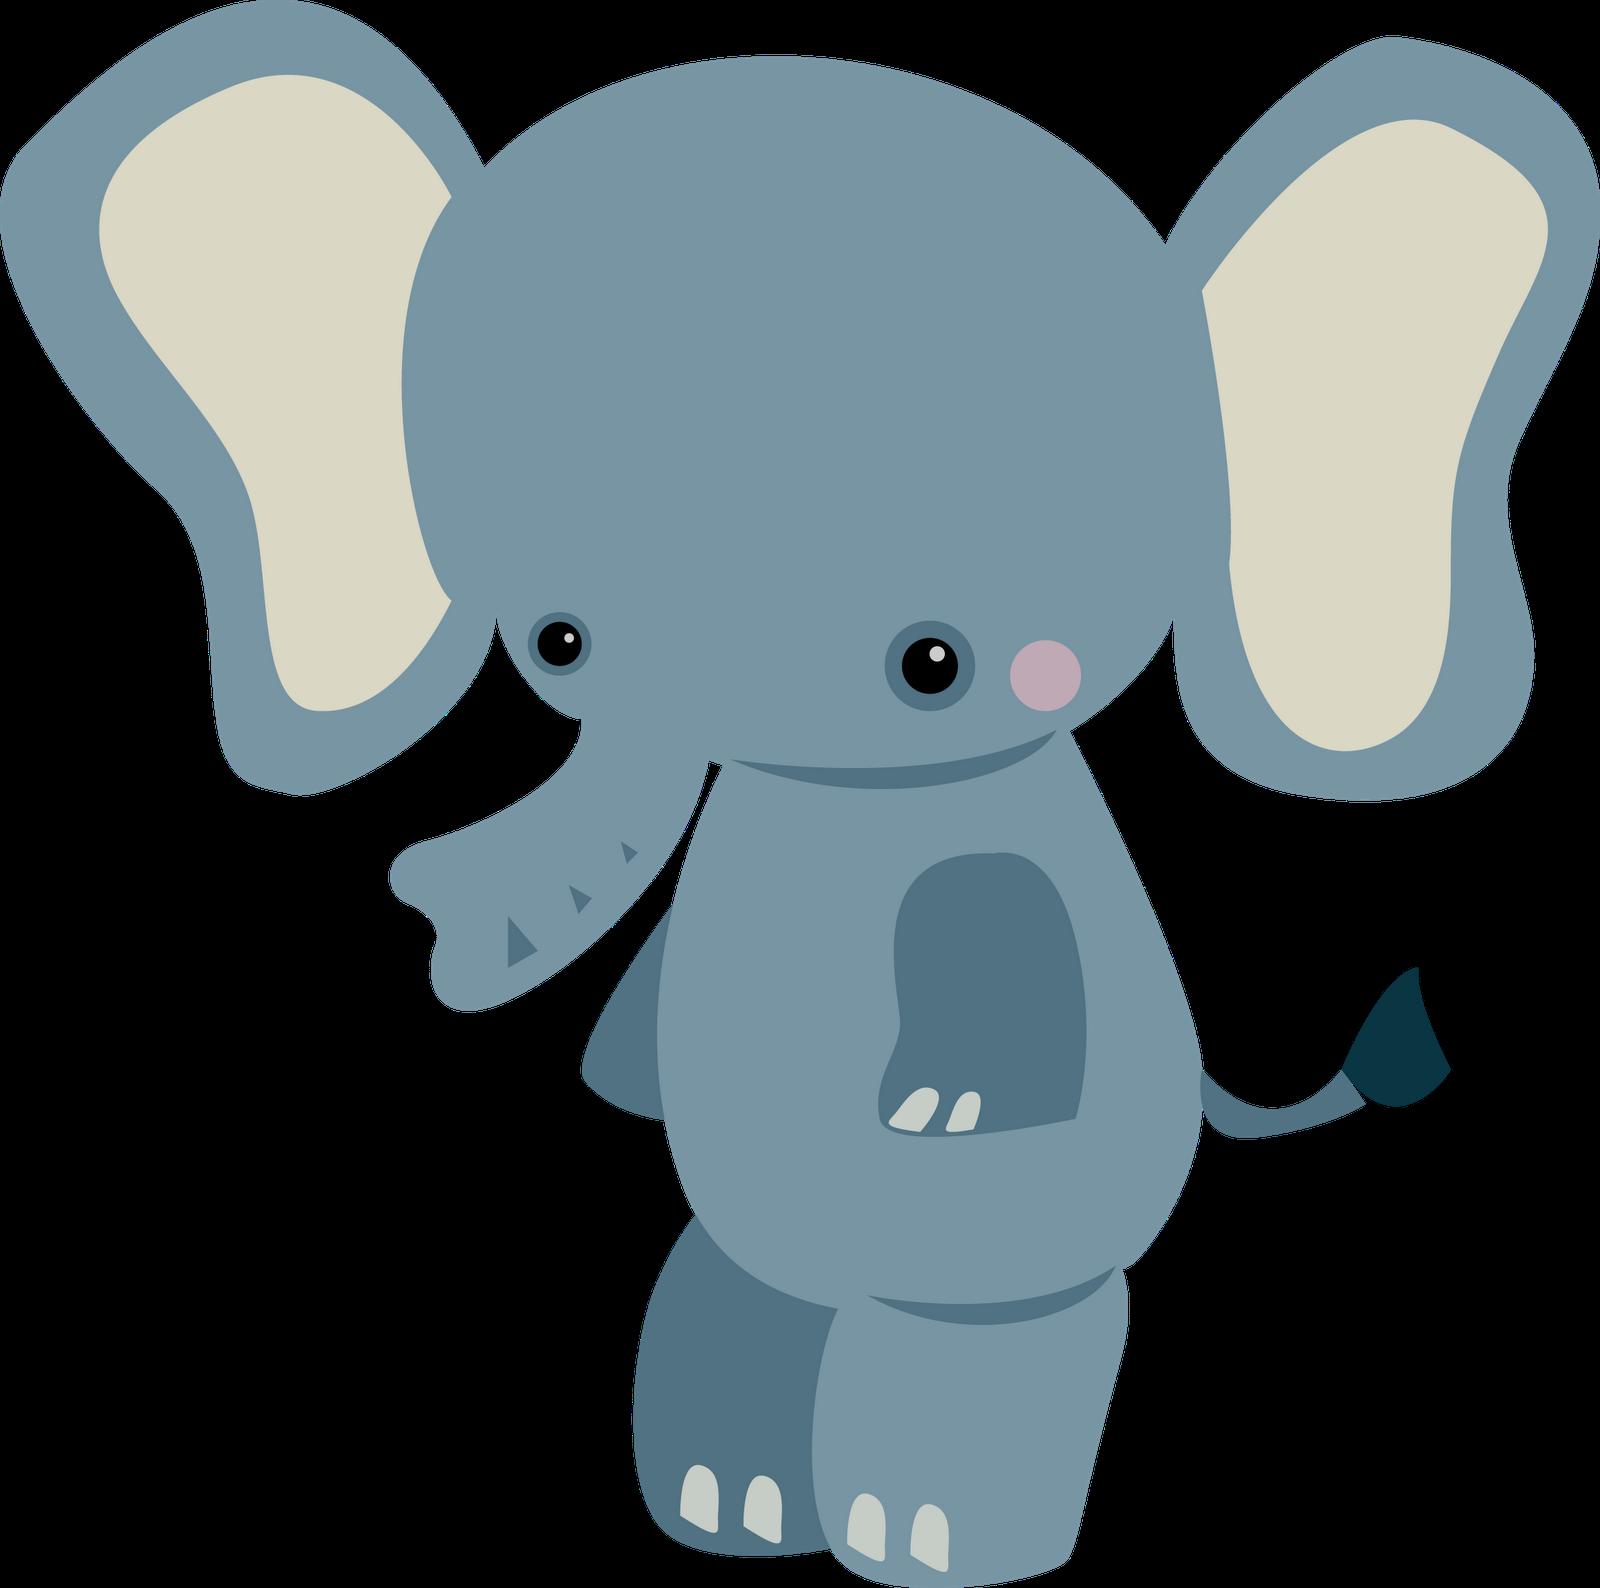 1600x1588 Fun Baby Jungle Animal Clip Art Baby Elephant Clip Art Zoo Jungle